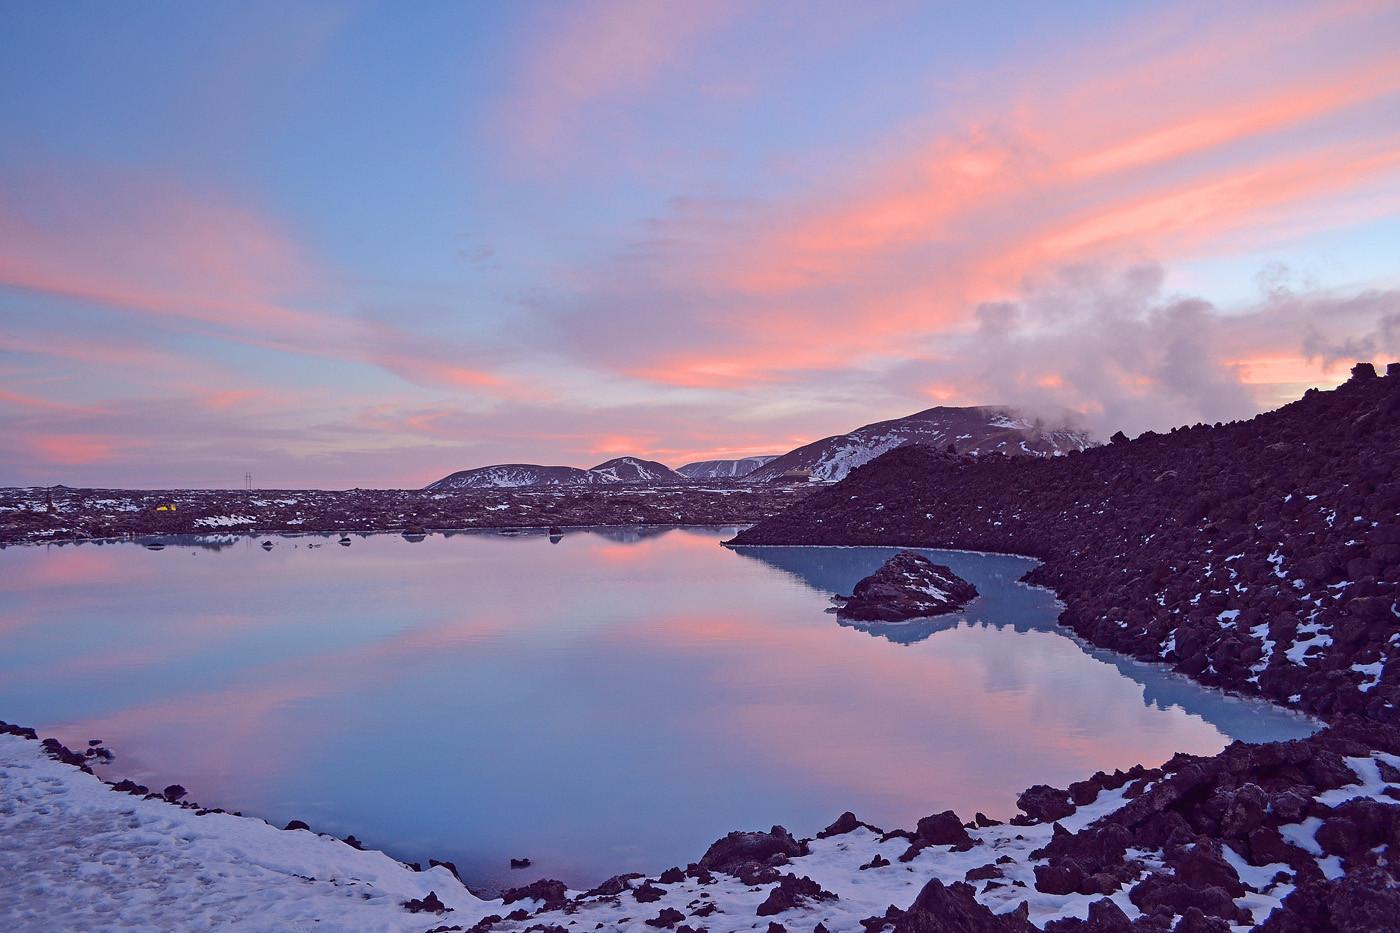 17 DAWN AT THE BLUE LAGOON ICELAND by Helen Mossman